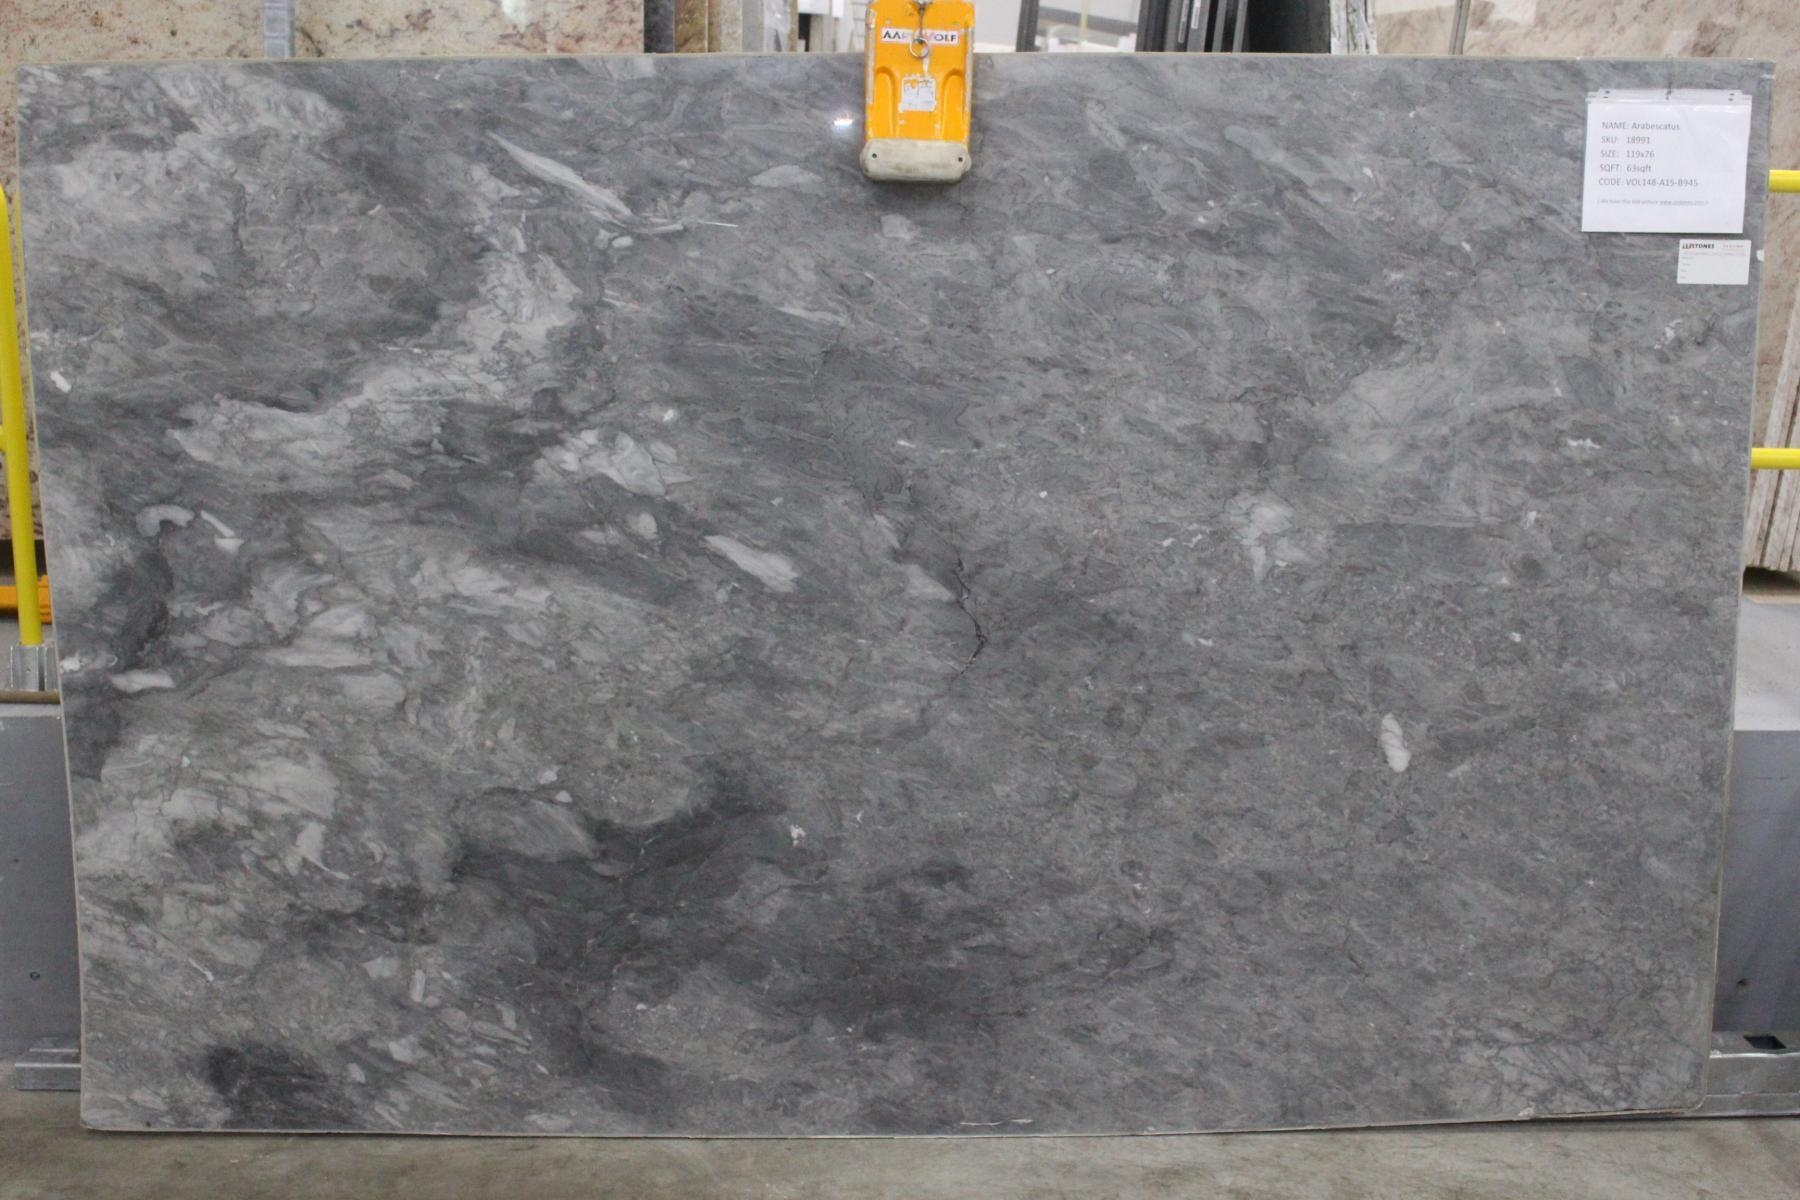 Arabescatus Jpg 1800 1200 Stone Countertops Flooring Countertops